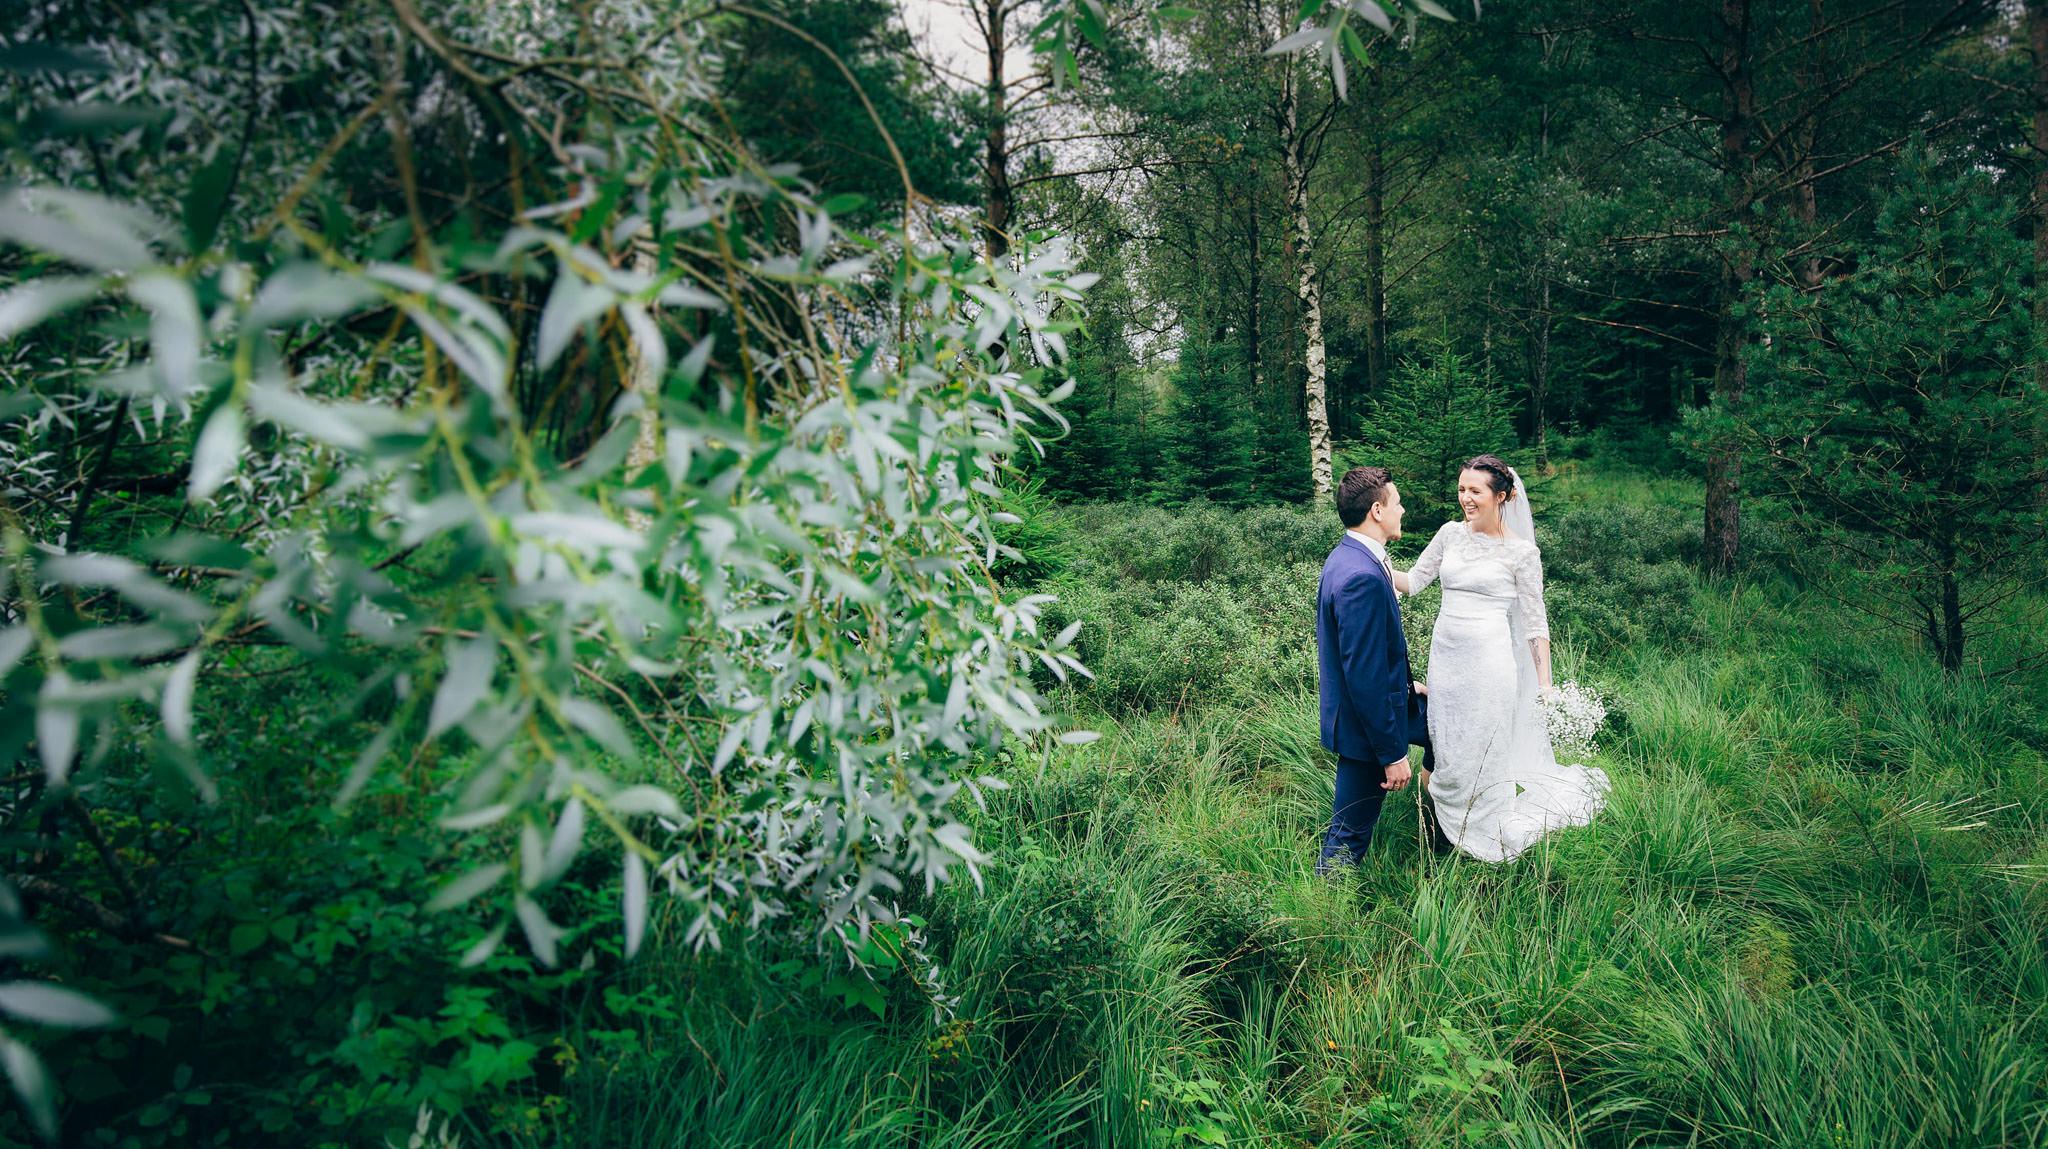 Norway+wedding+photographer+elopement+pre+wedding+Casey+Arneson-62.jpg